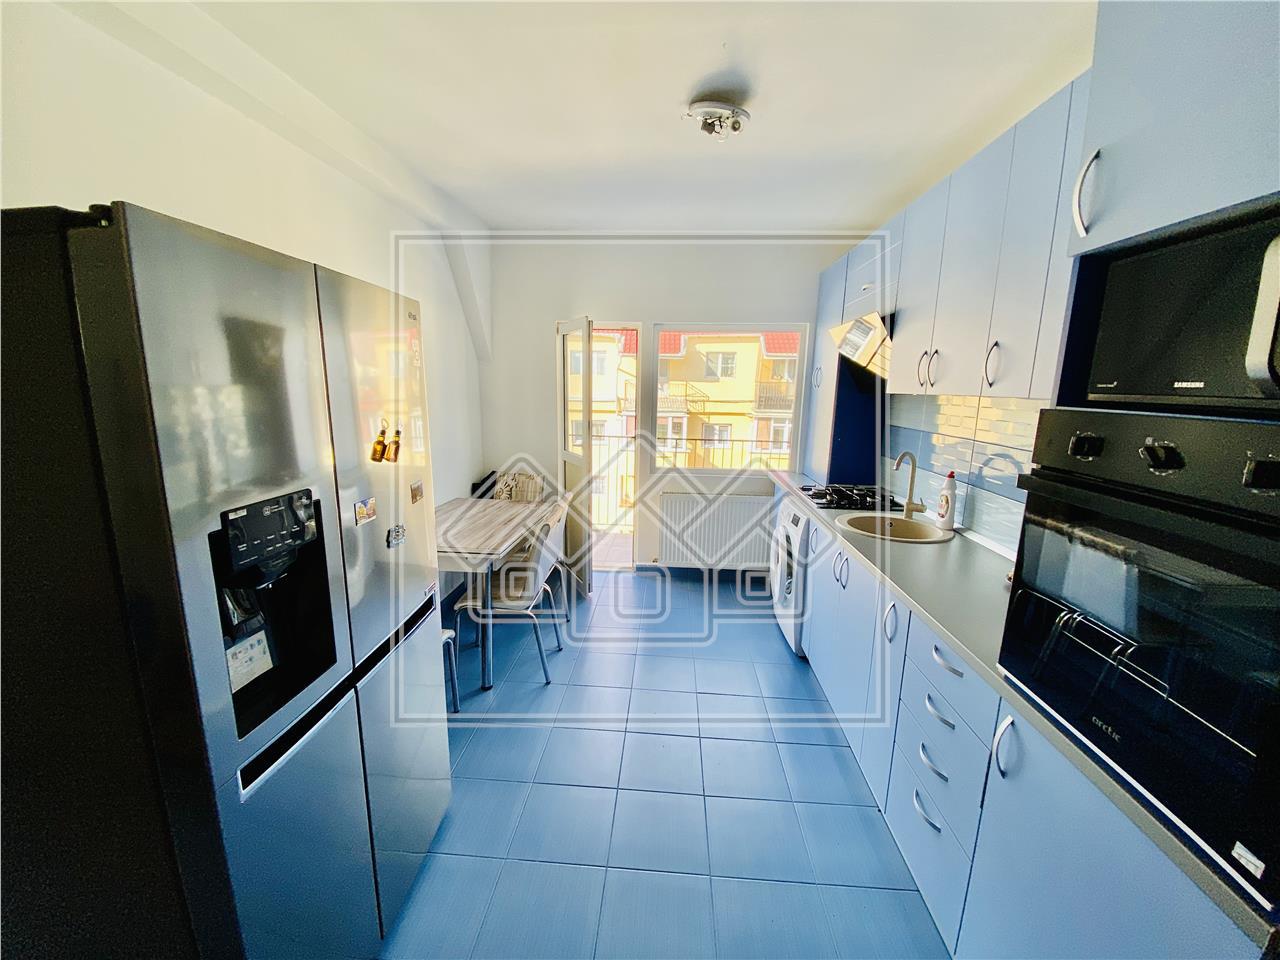 Apartament de vanzare in Sibiu-3 camere cu 2 balcoane-Valea Aurie